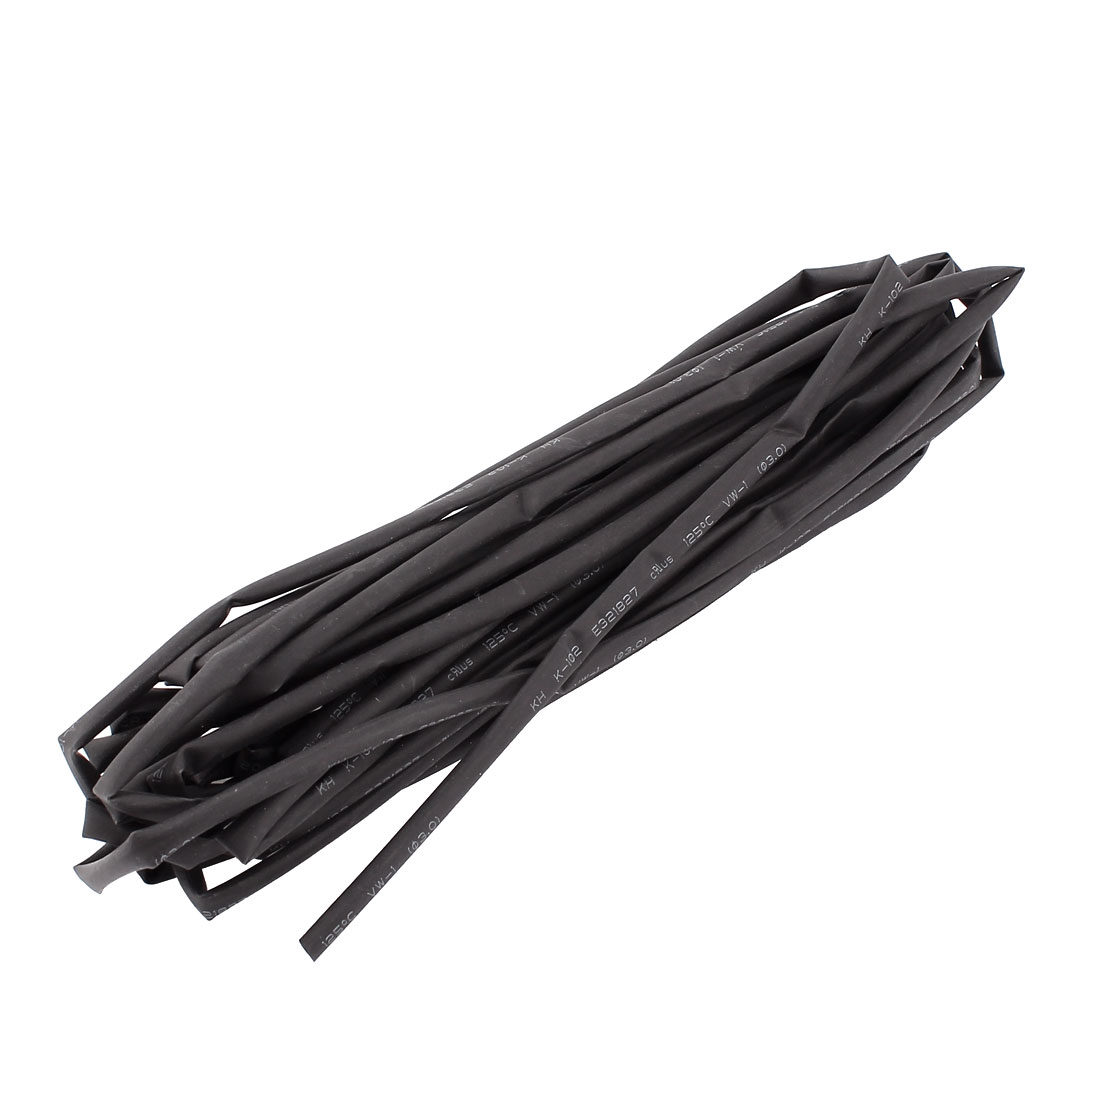 Black 3mm Dia 2:1 Polyolefin Heat Shrink Tubing Shrinkable Tube 7M 23Ft